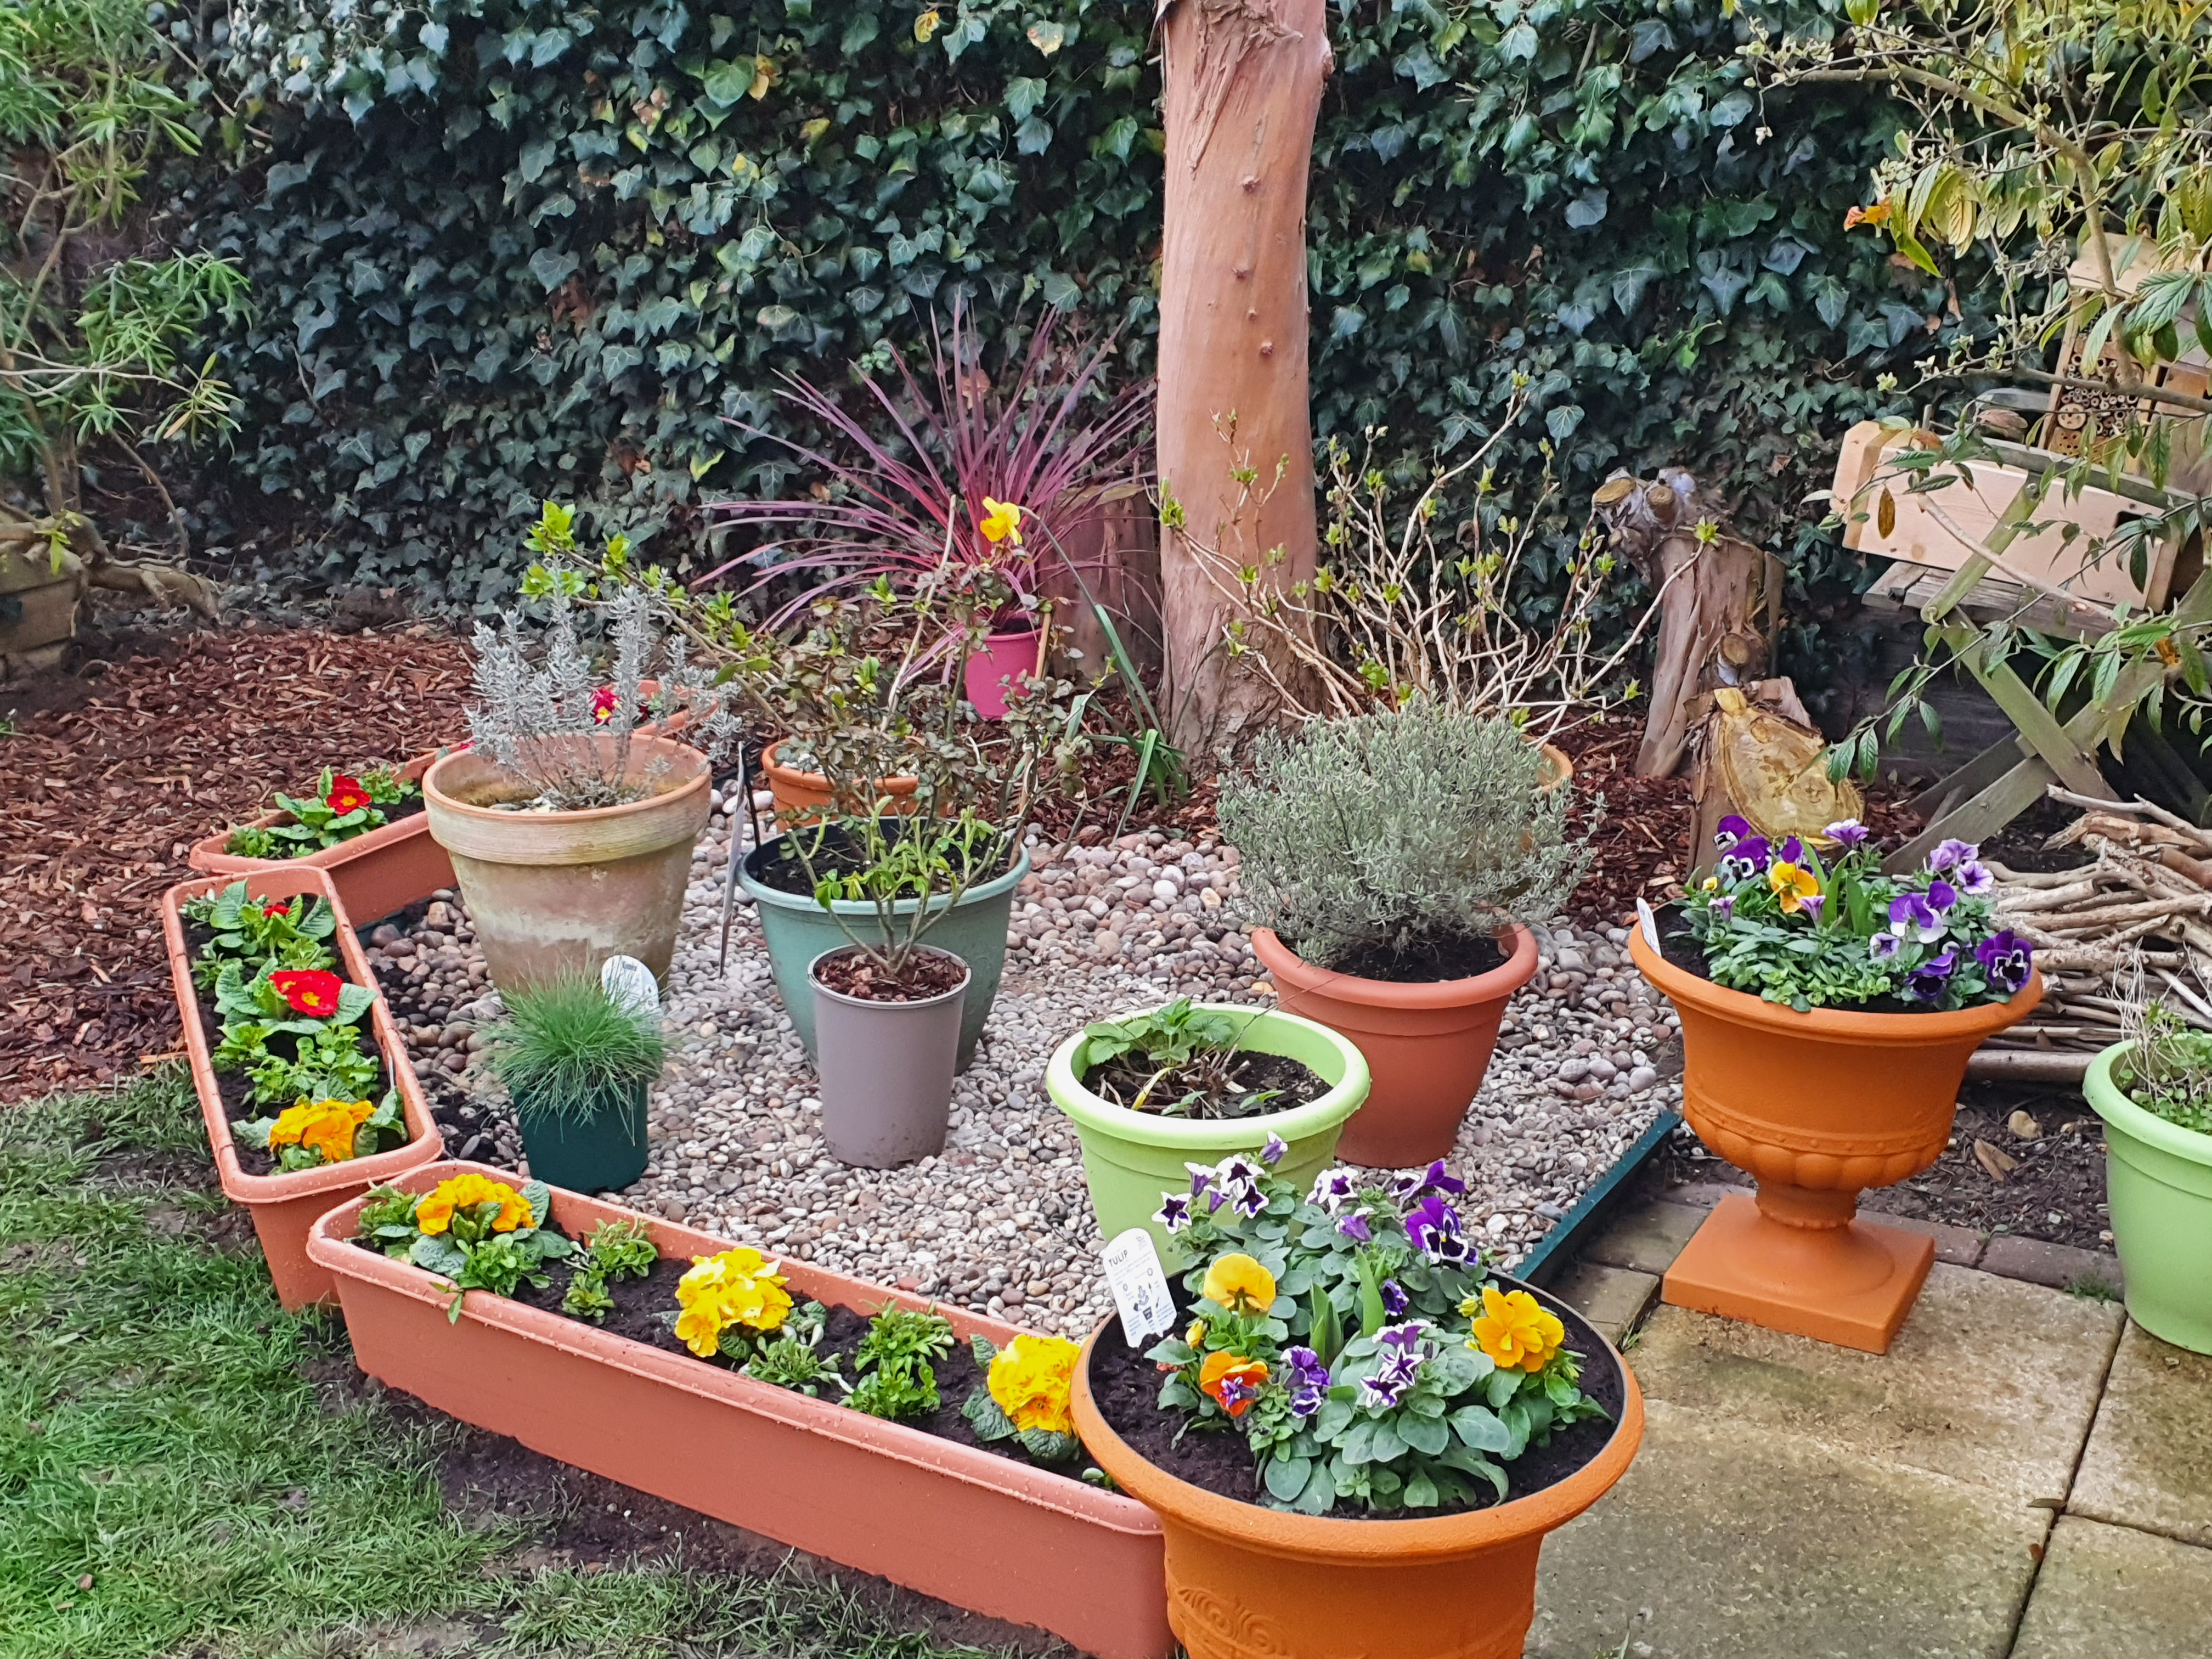 Shrubs varieties in pots on pebbles